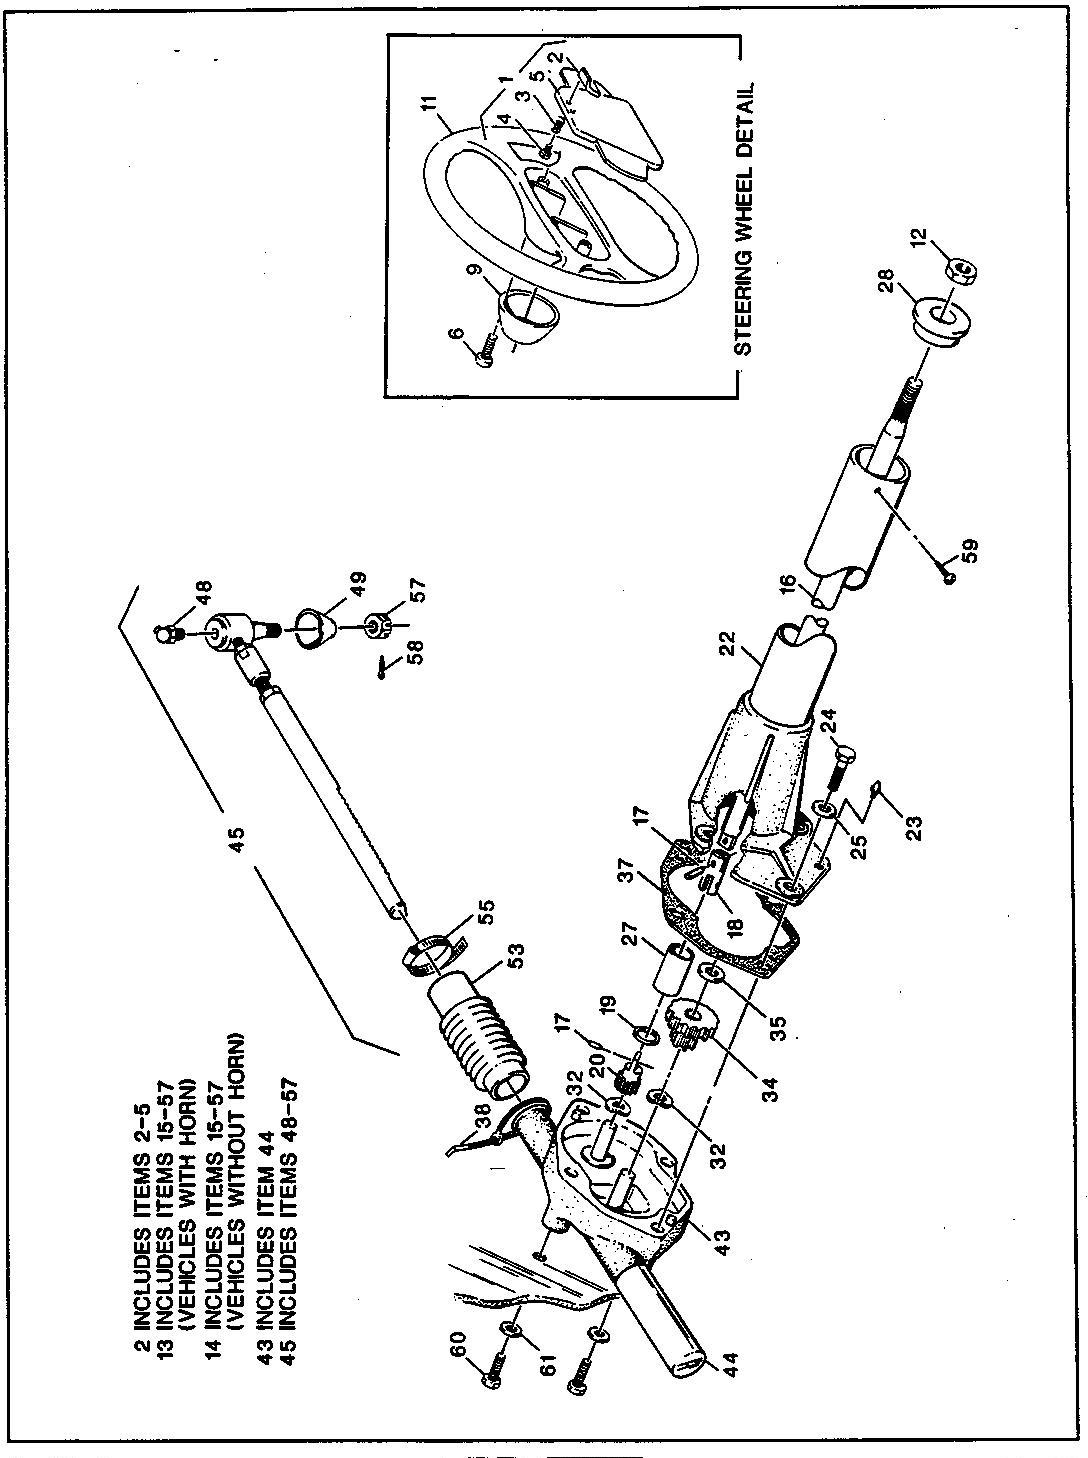 Gx 440